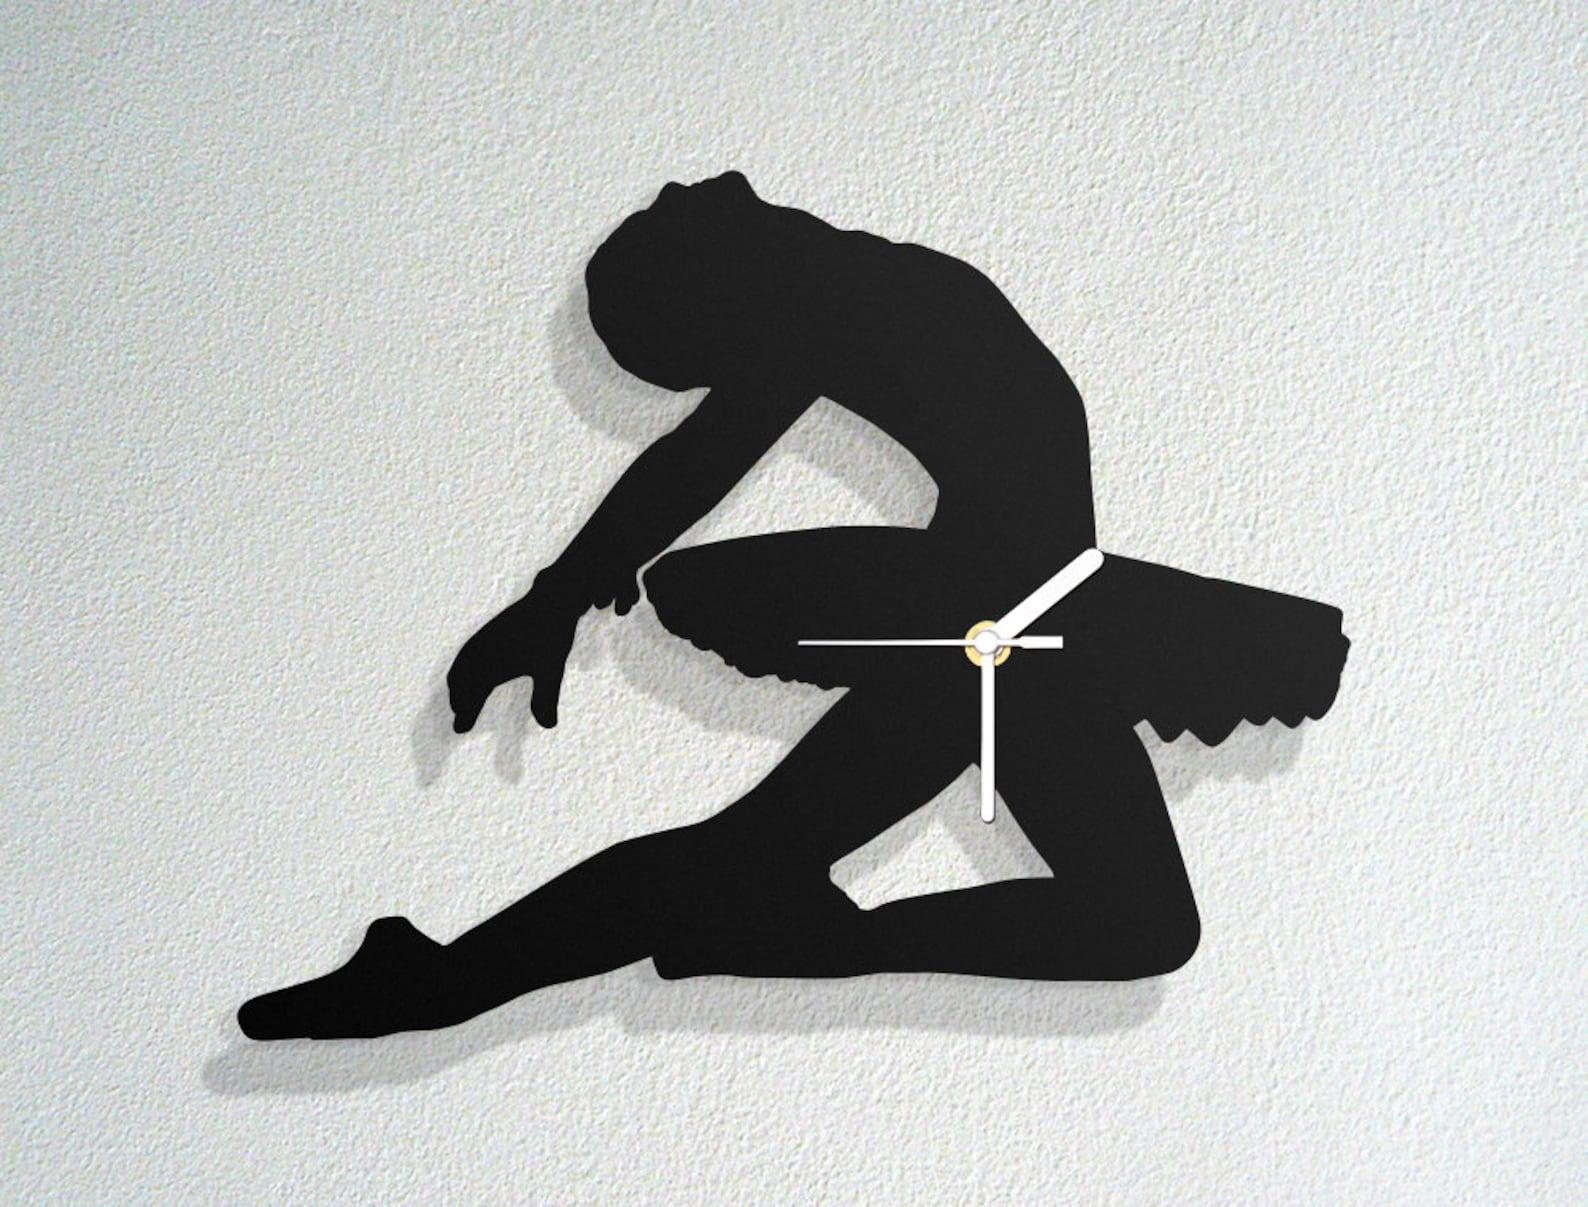 ballerina - ballet dancer talent passion - arabesque pirouette - swan lake pointe shoes - modern novelty gift - custom acrylic w